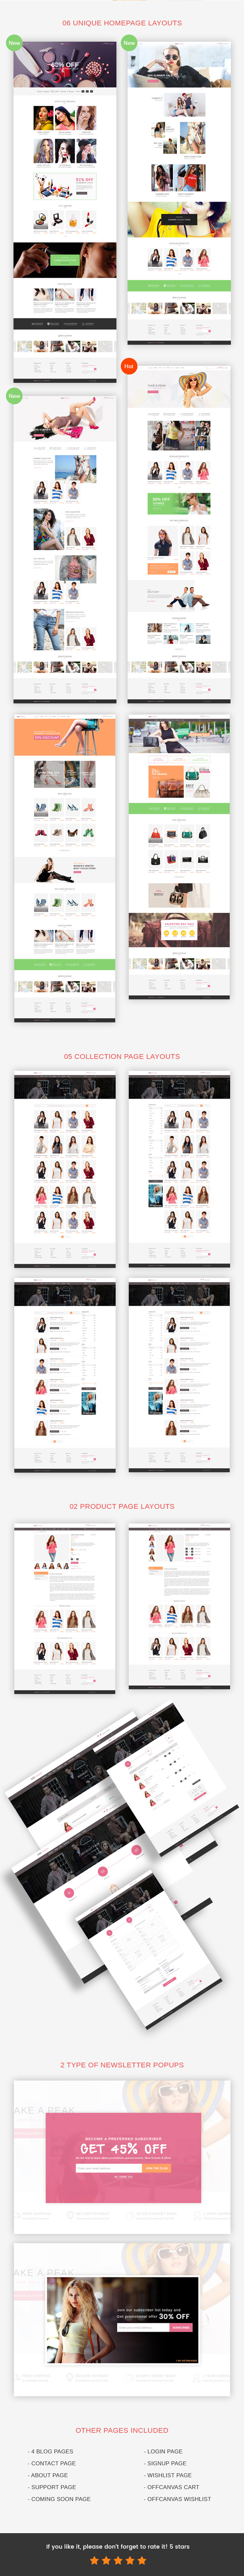 RAB - Fashion eCommerce HTML5 Template - 3